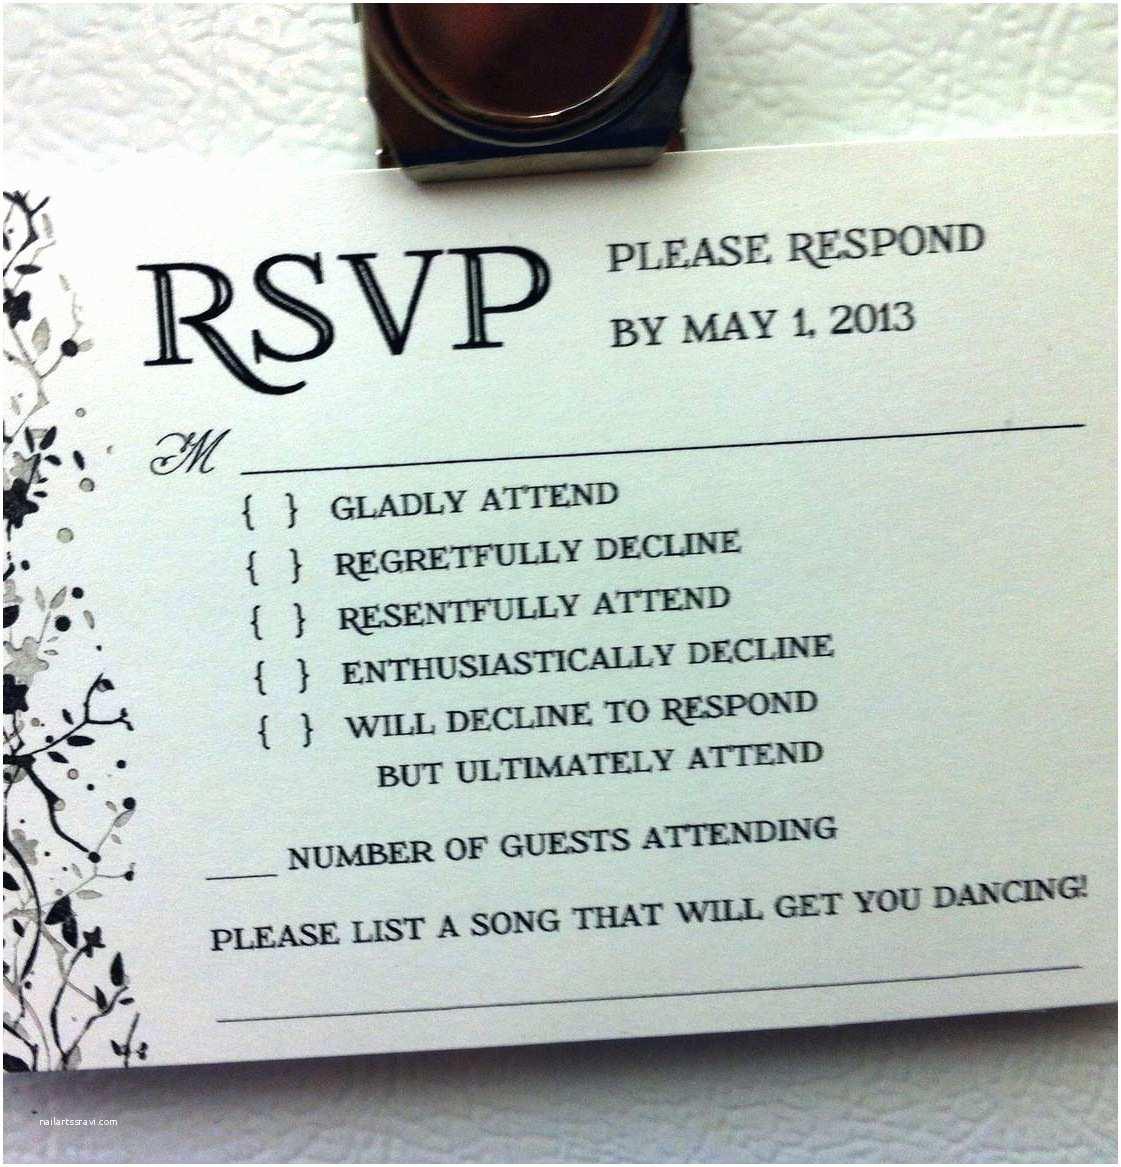 Wedding Invitation Response Buboblog A New York City Dad Smart Idea for A Wedding